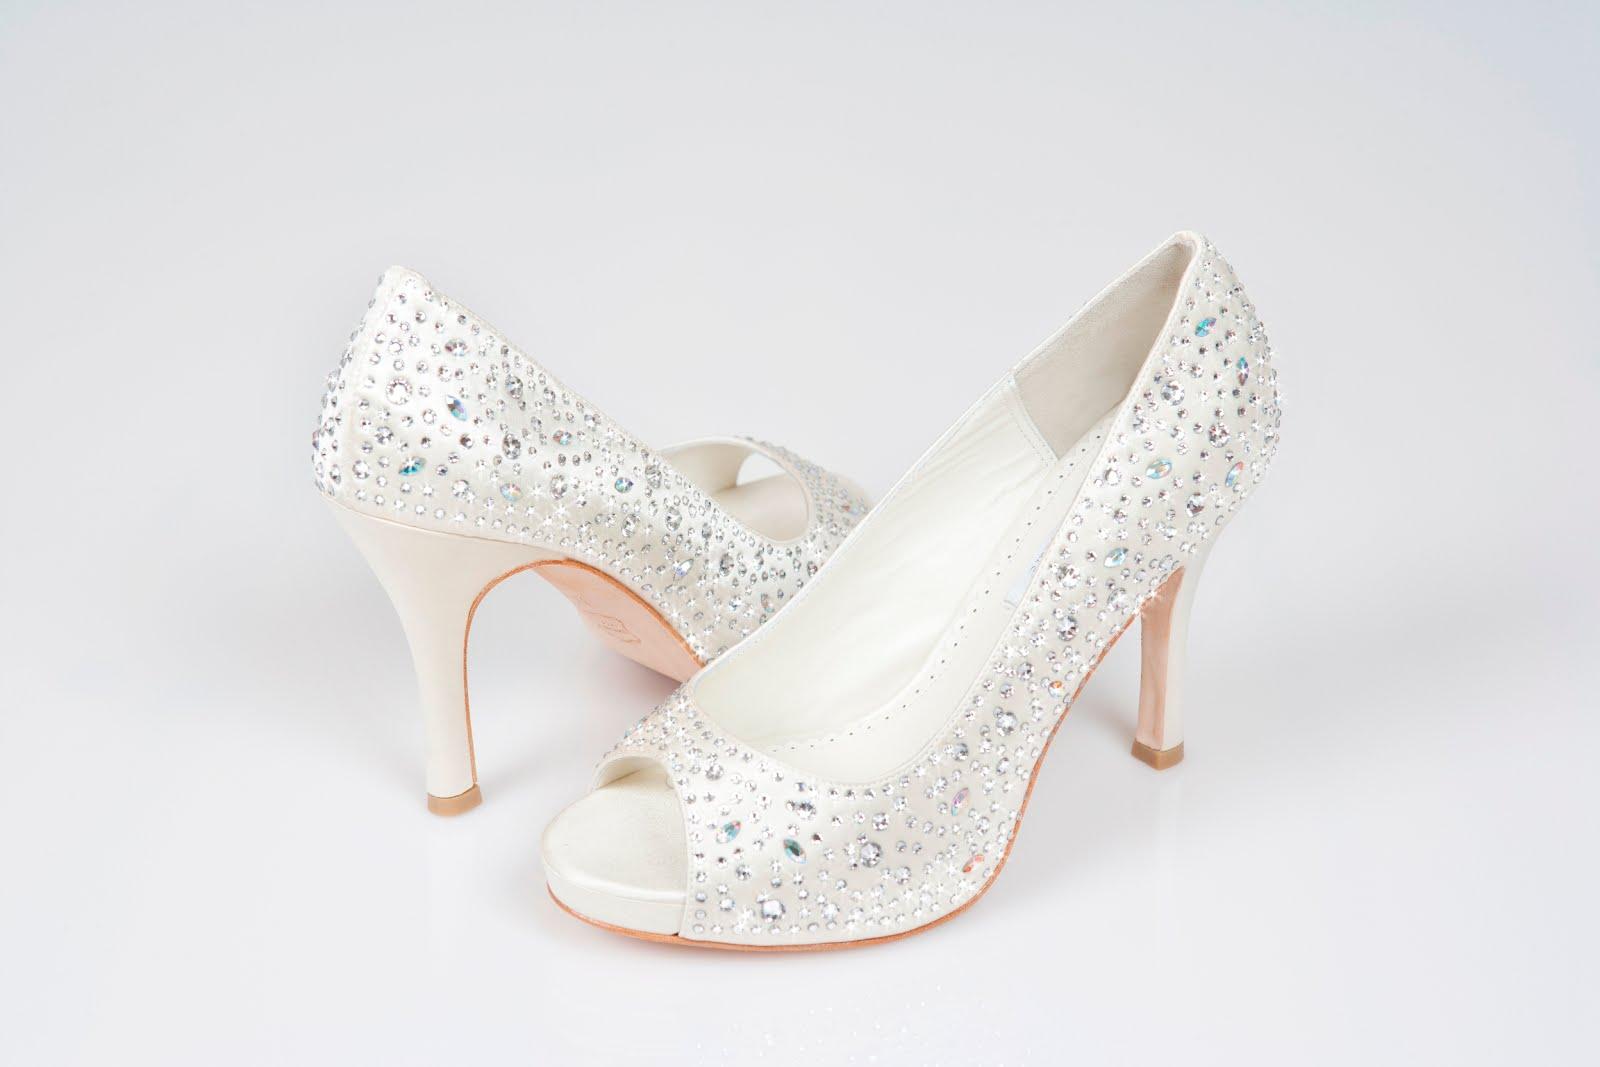 f2503db225654 Paradox Bridal Shoes Bridal Shoes Low Heel 2014 UK Wedges Flats Designer  Photos Pics Images Wallpapers